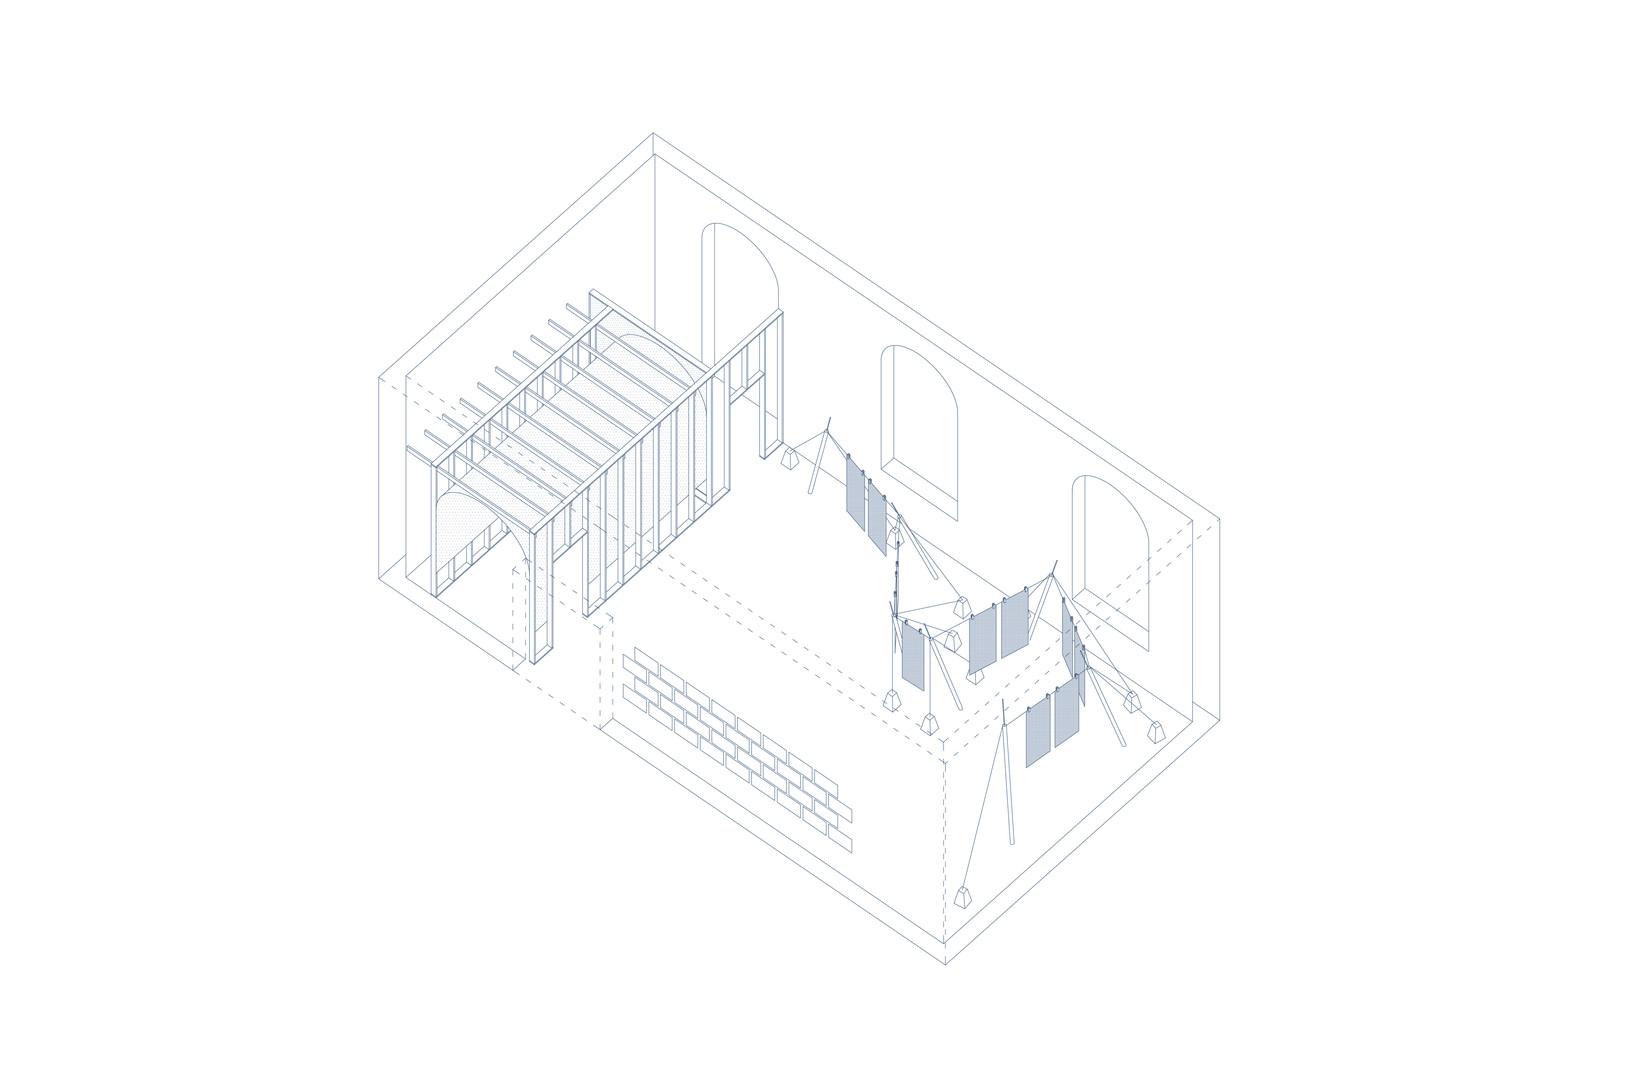 Montaje_axos-Model.jpg